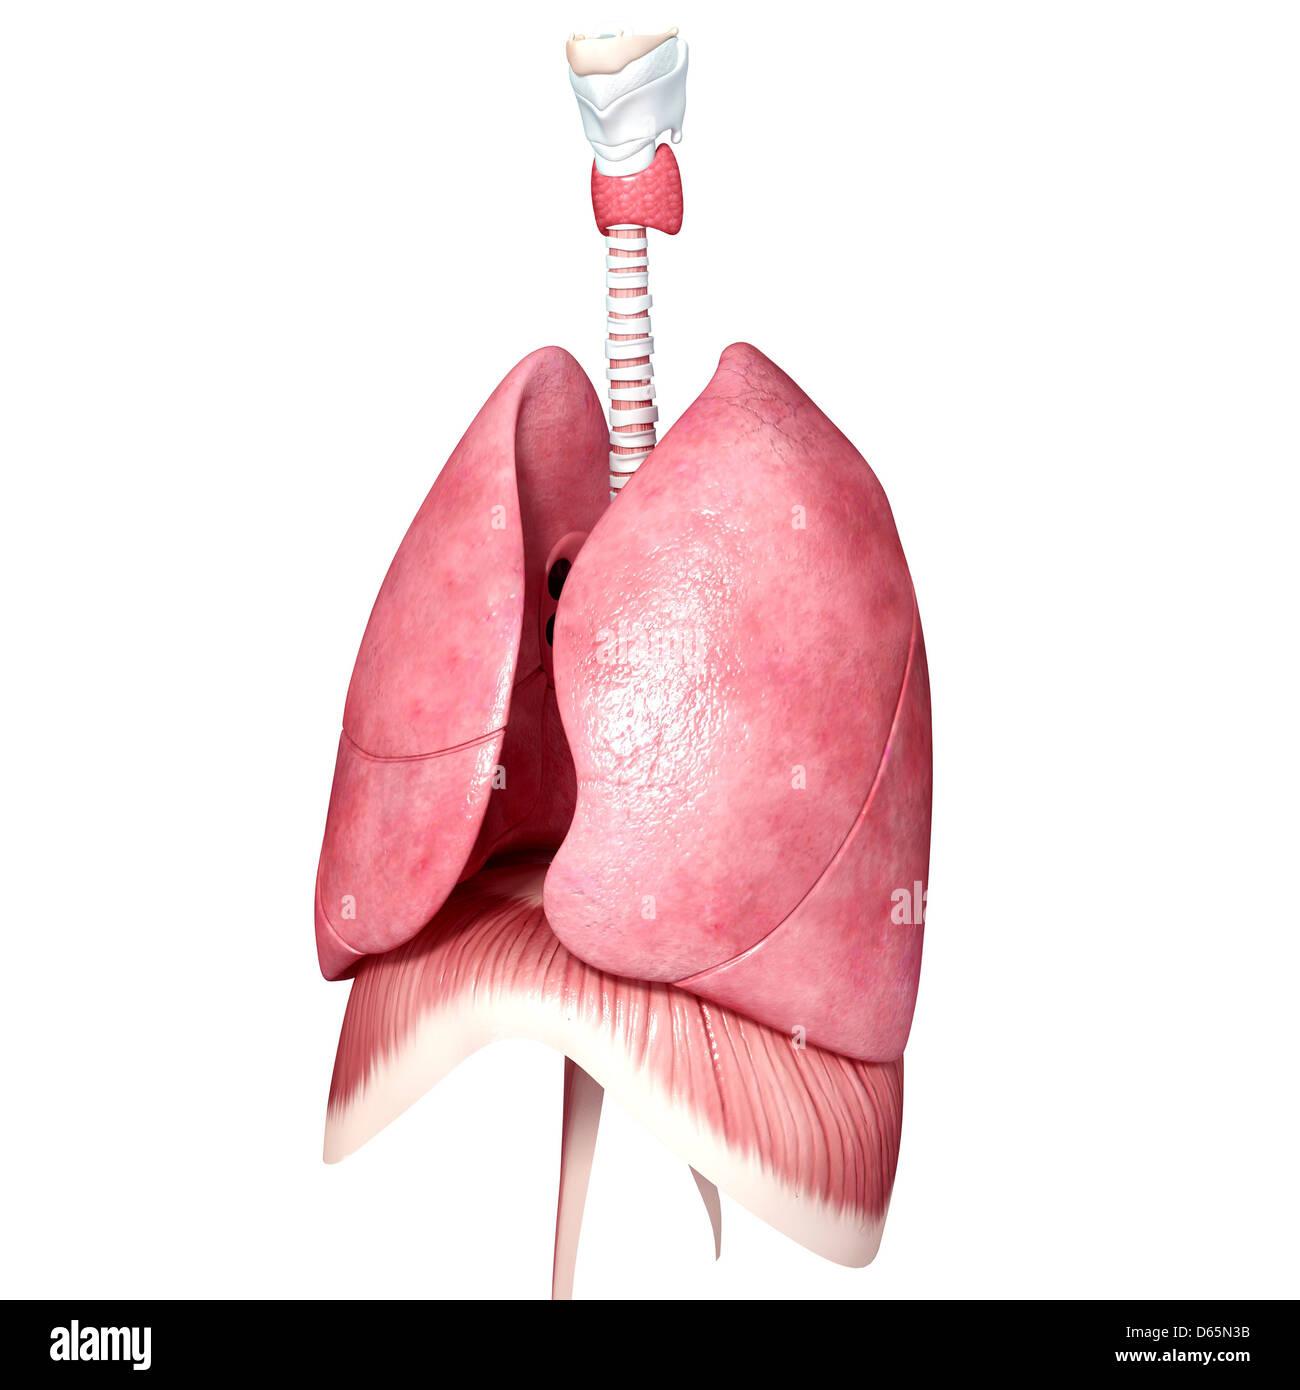 Brust-Anatomie, artwork Stockfoto, Bild: 55445359 - Alamy